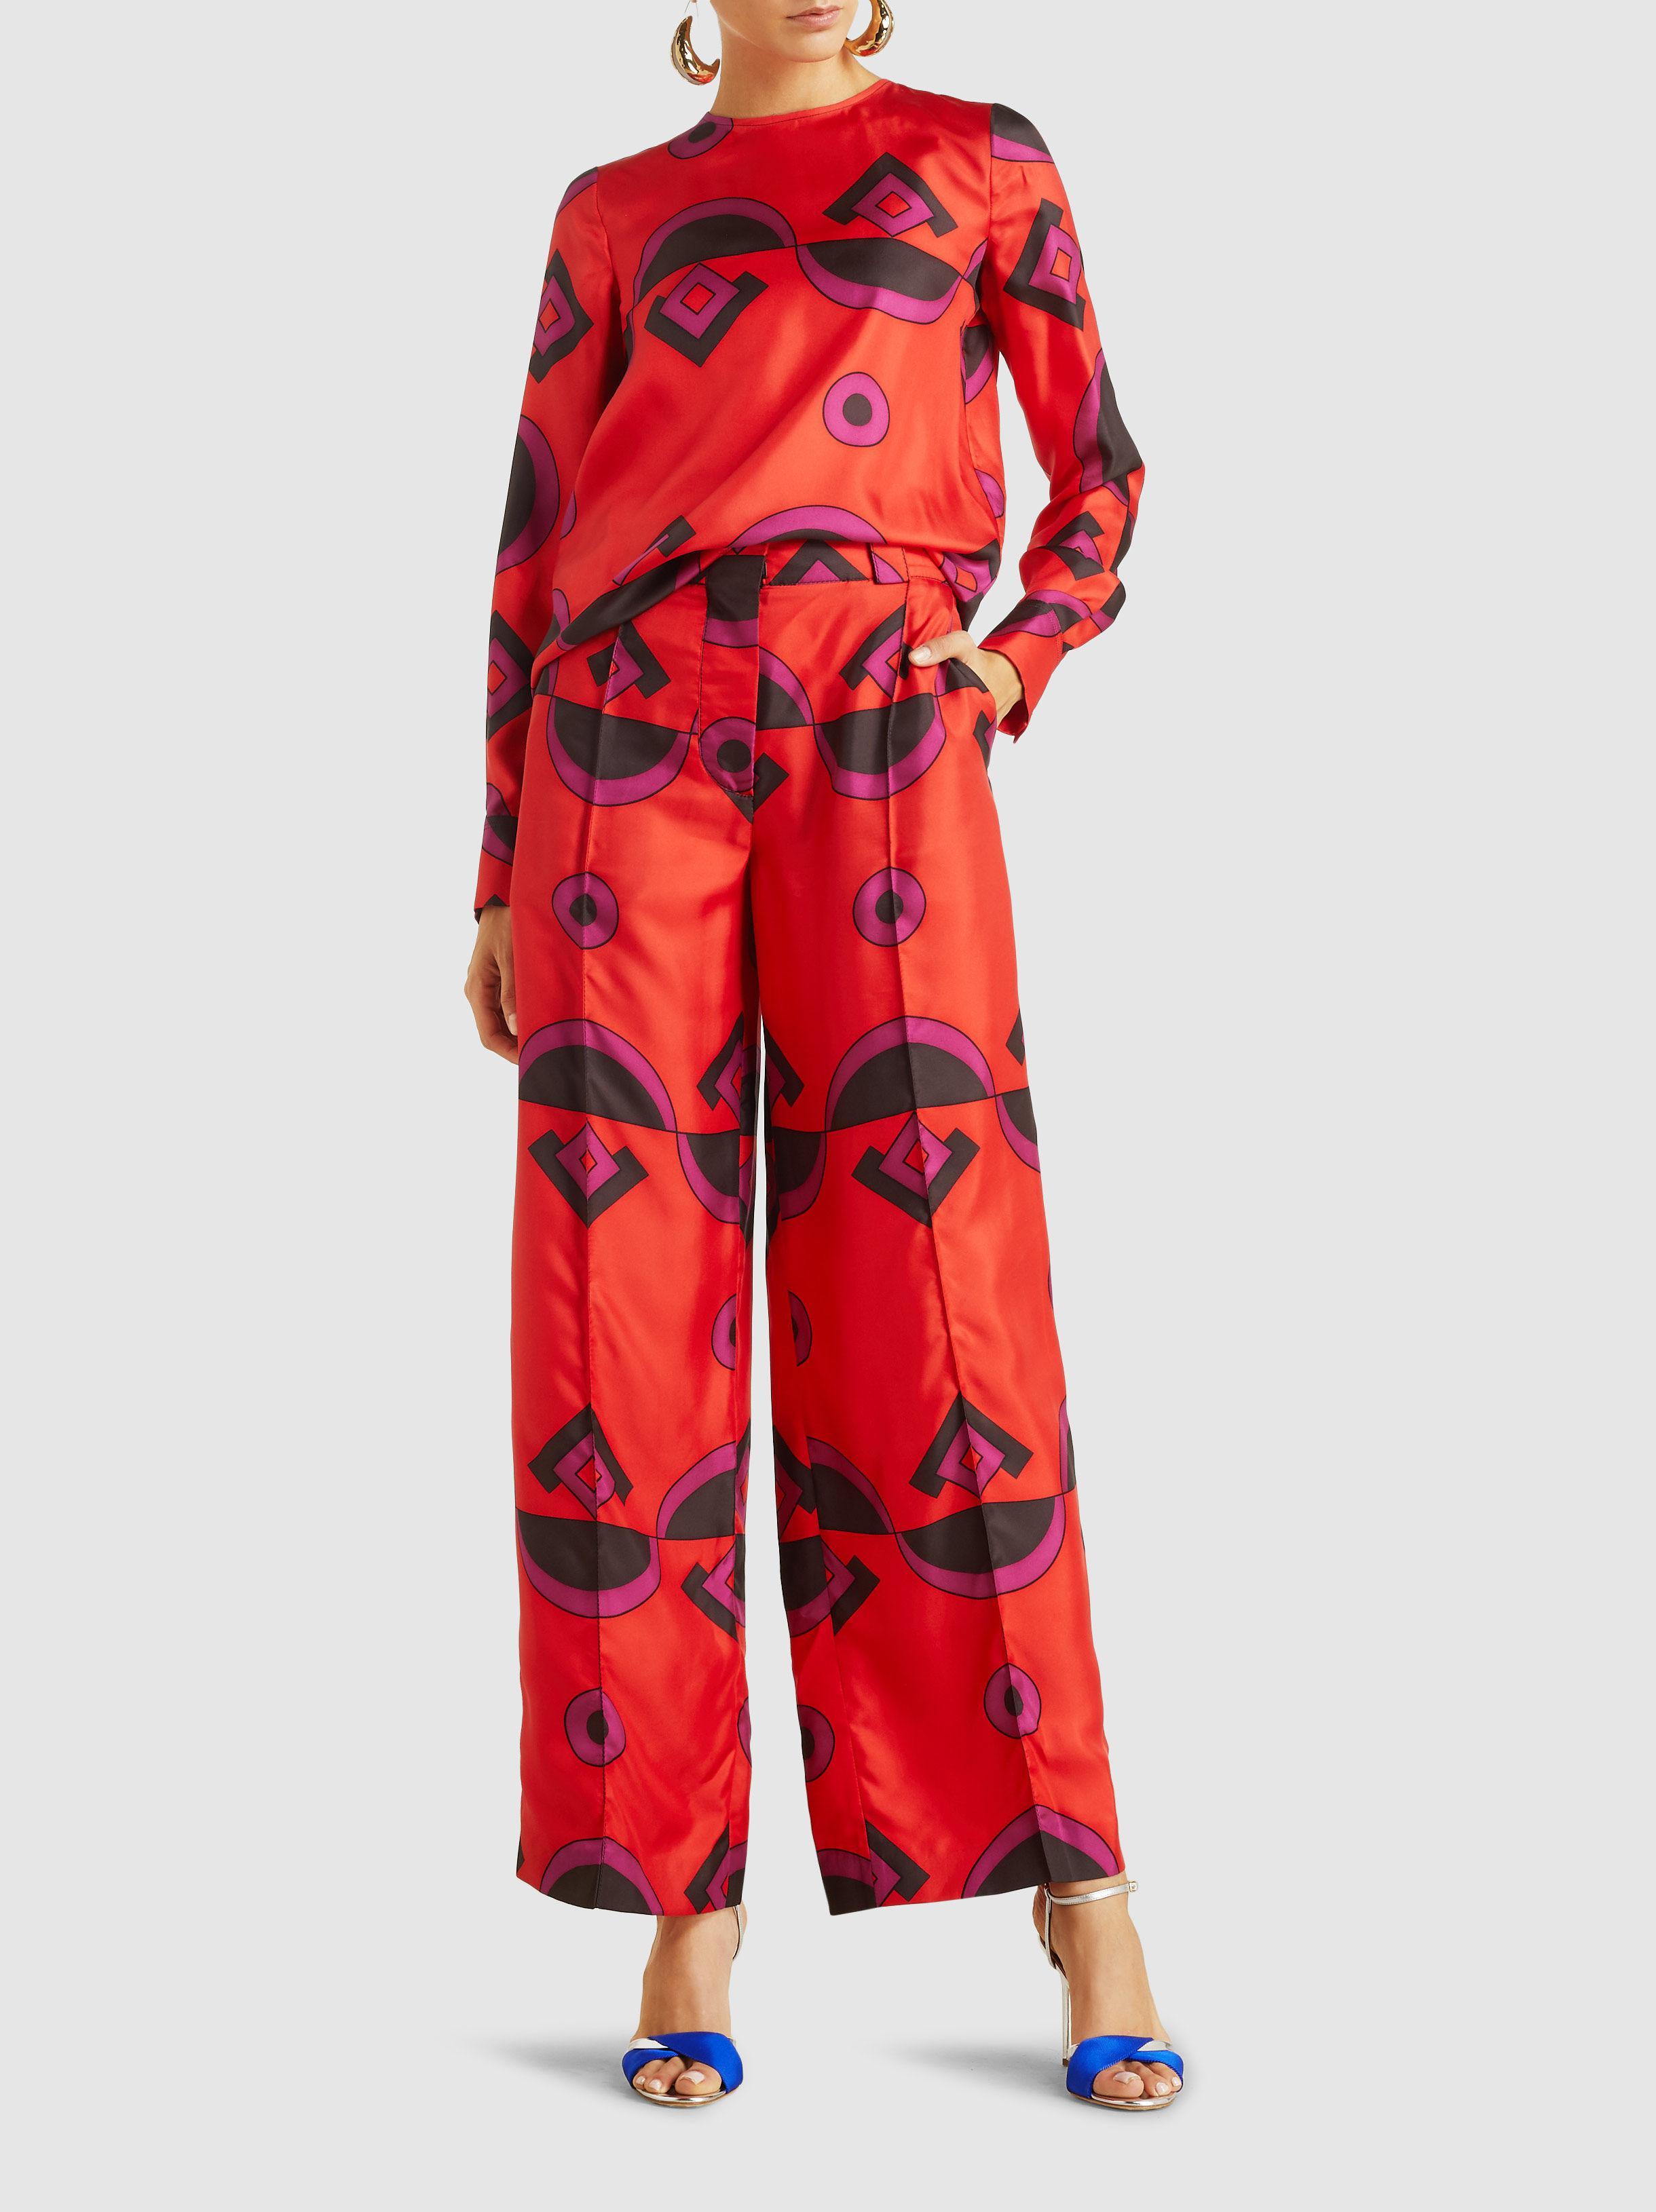 61c237f5ba Marni - Red Geometric Print Silk Blouse - Lyst. View fullscreen